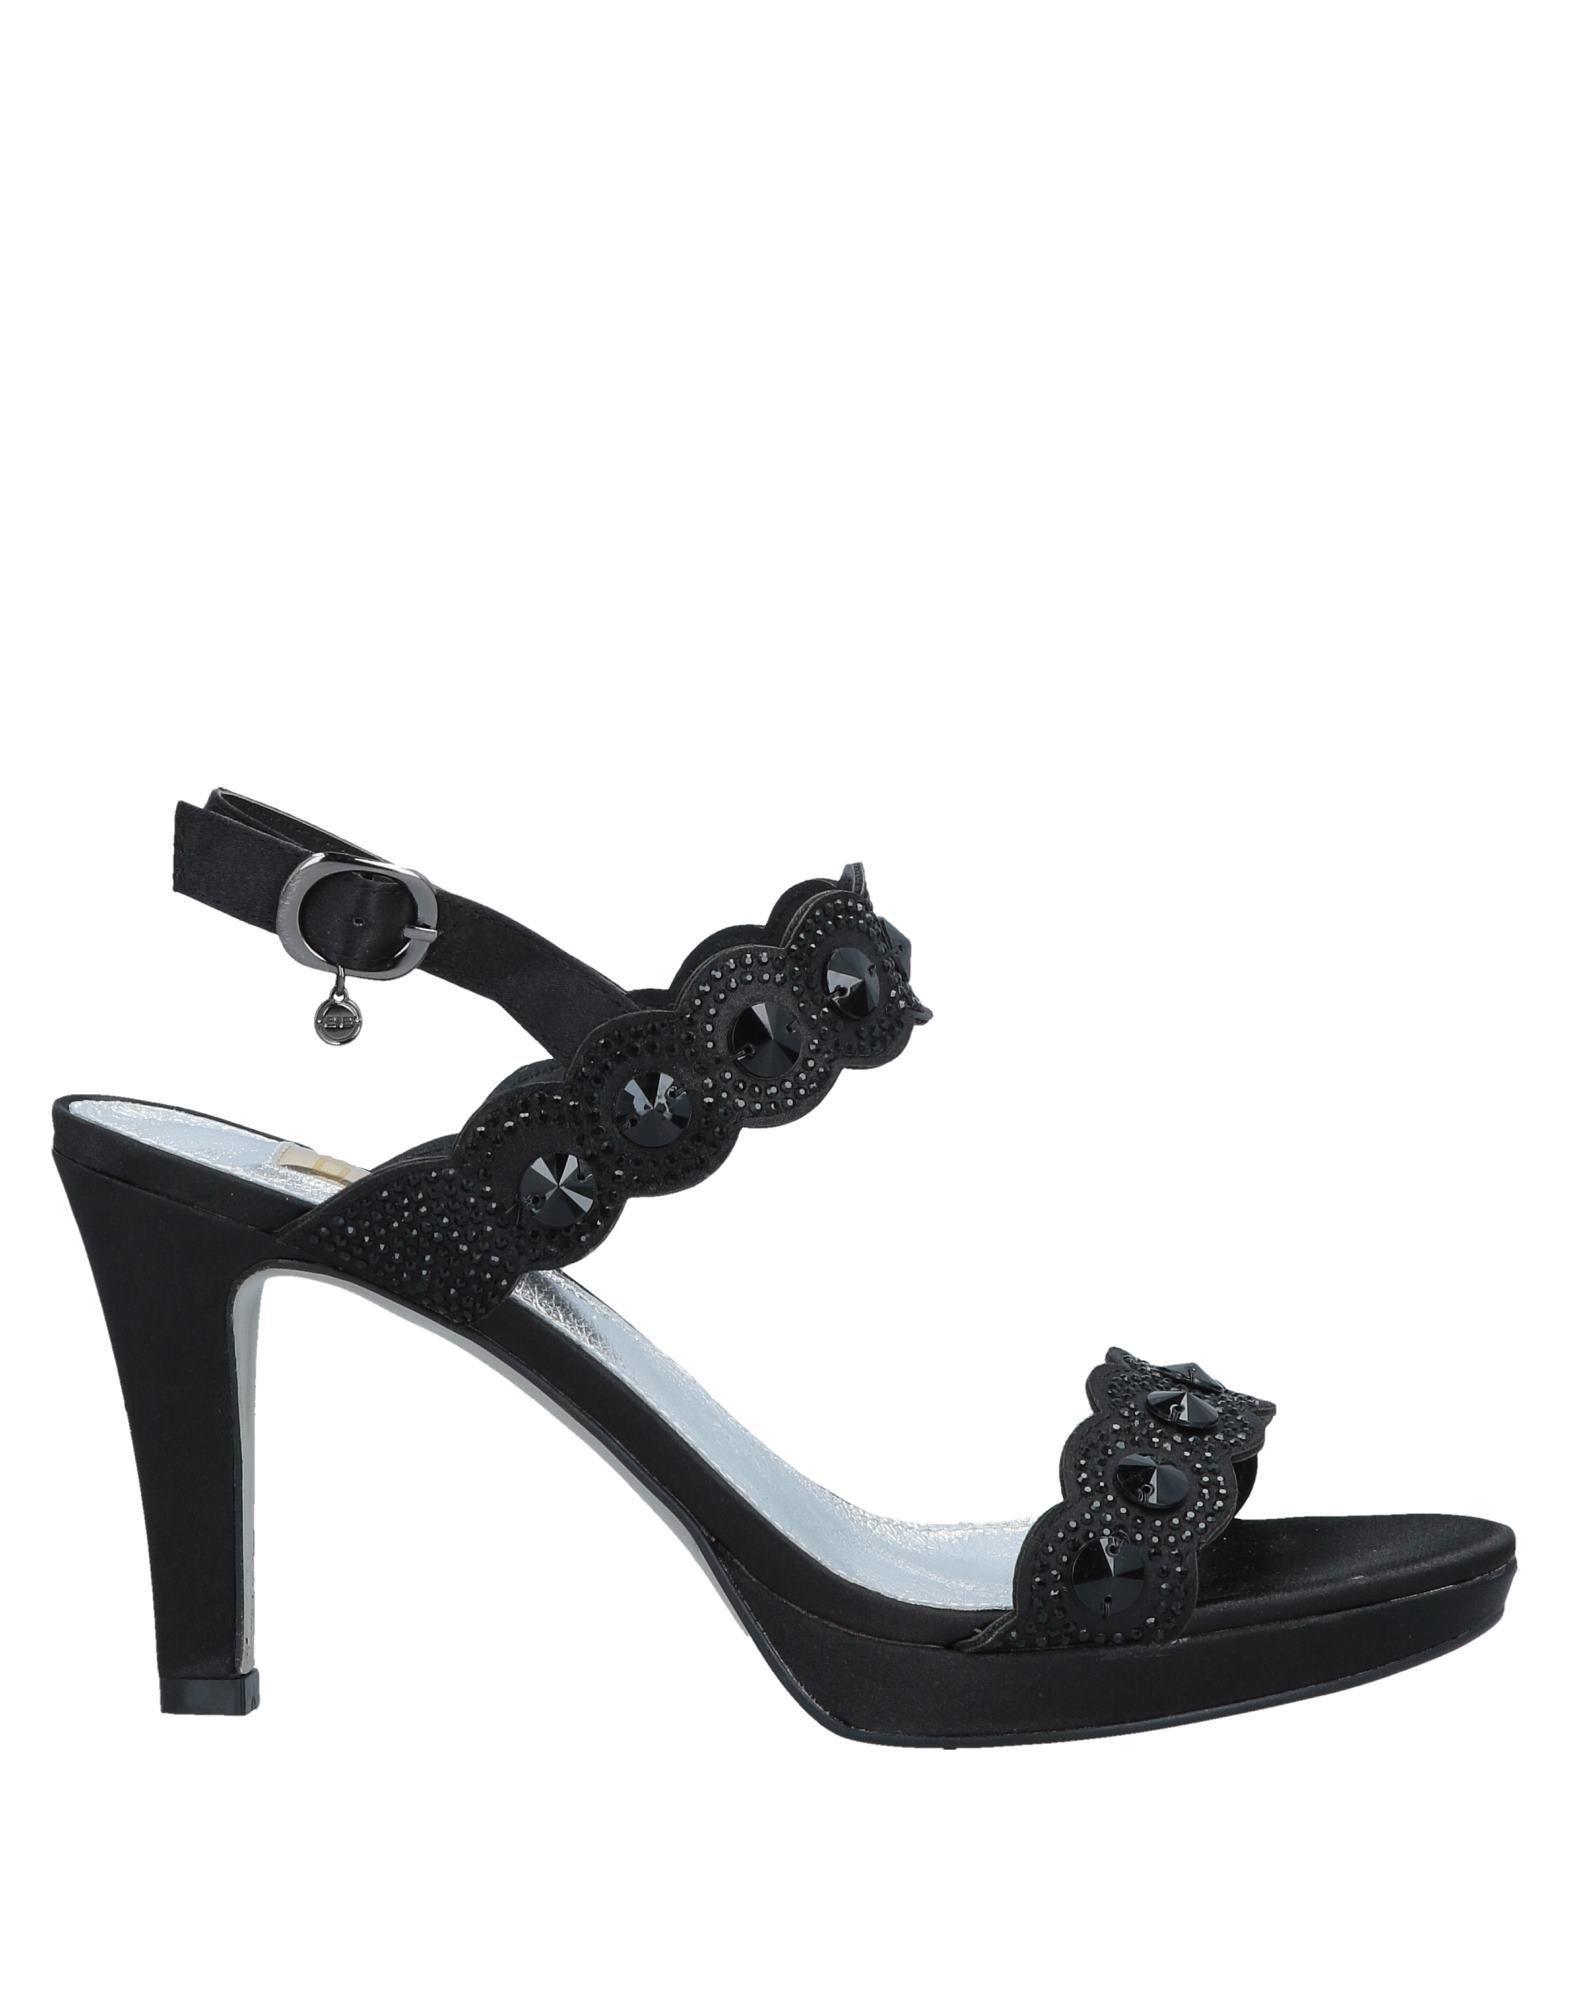 Sandals Black Lyst In 06 Milano wRxq4A